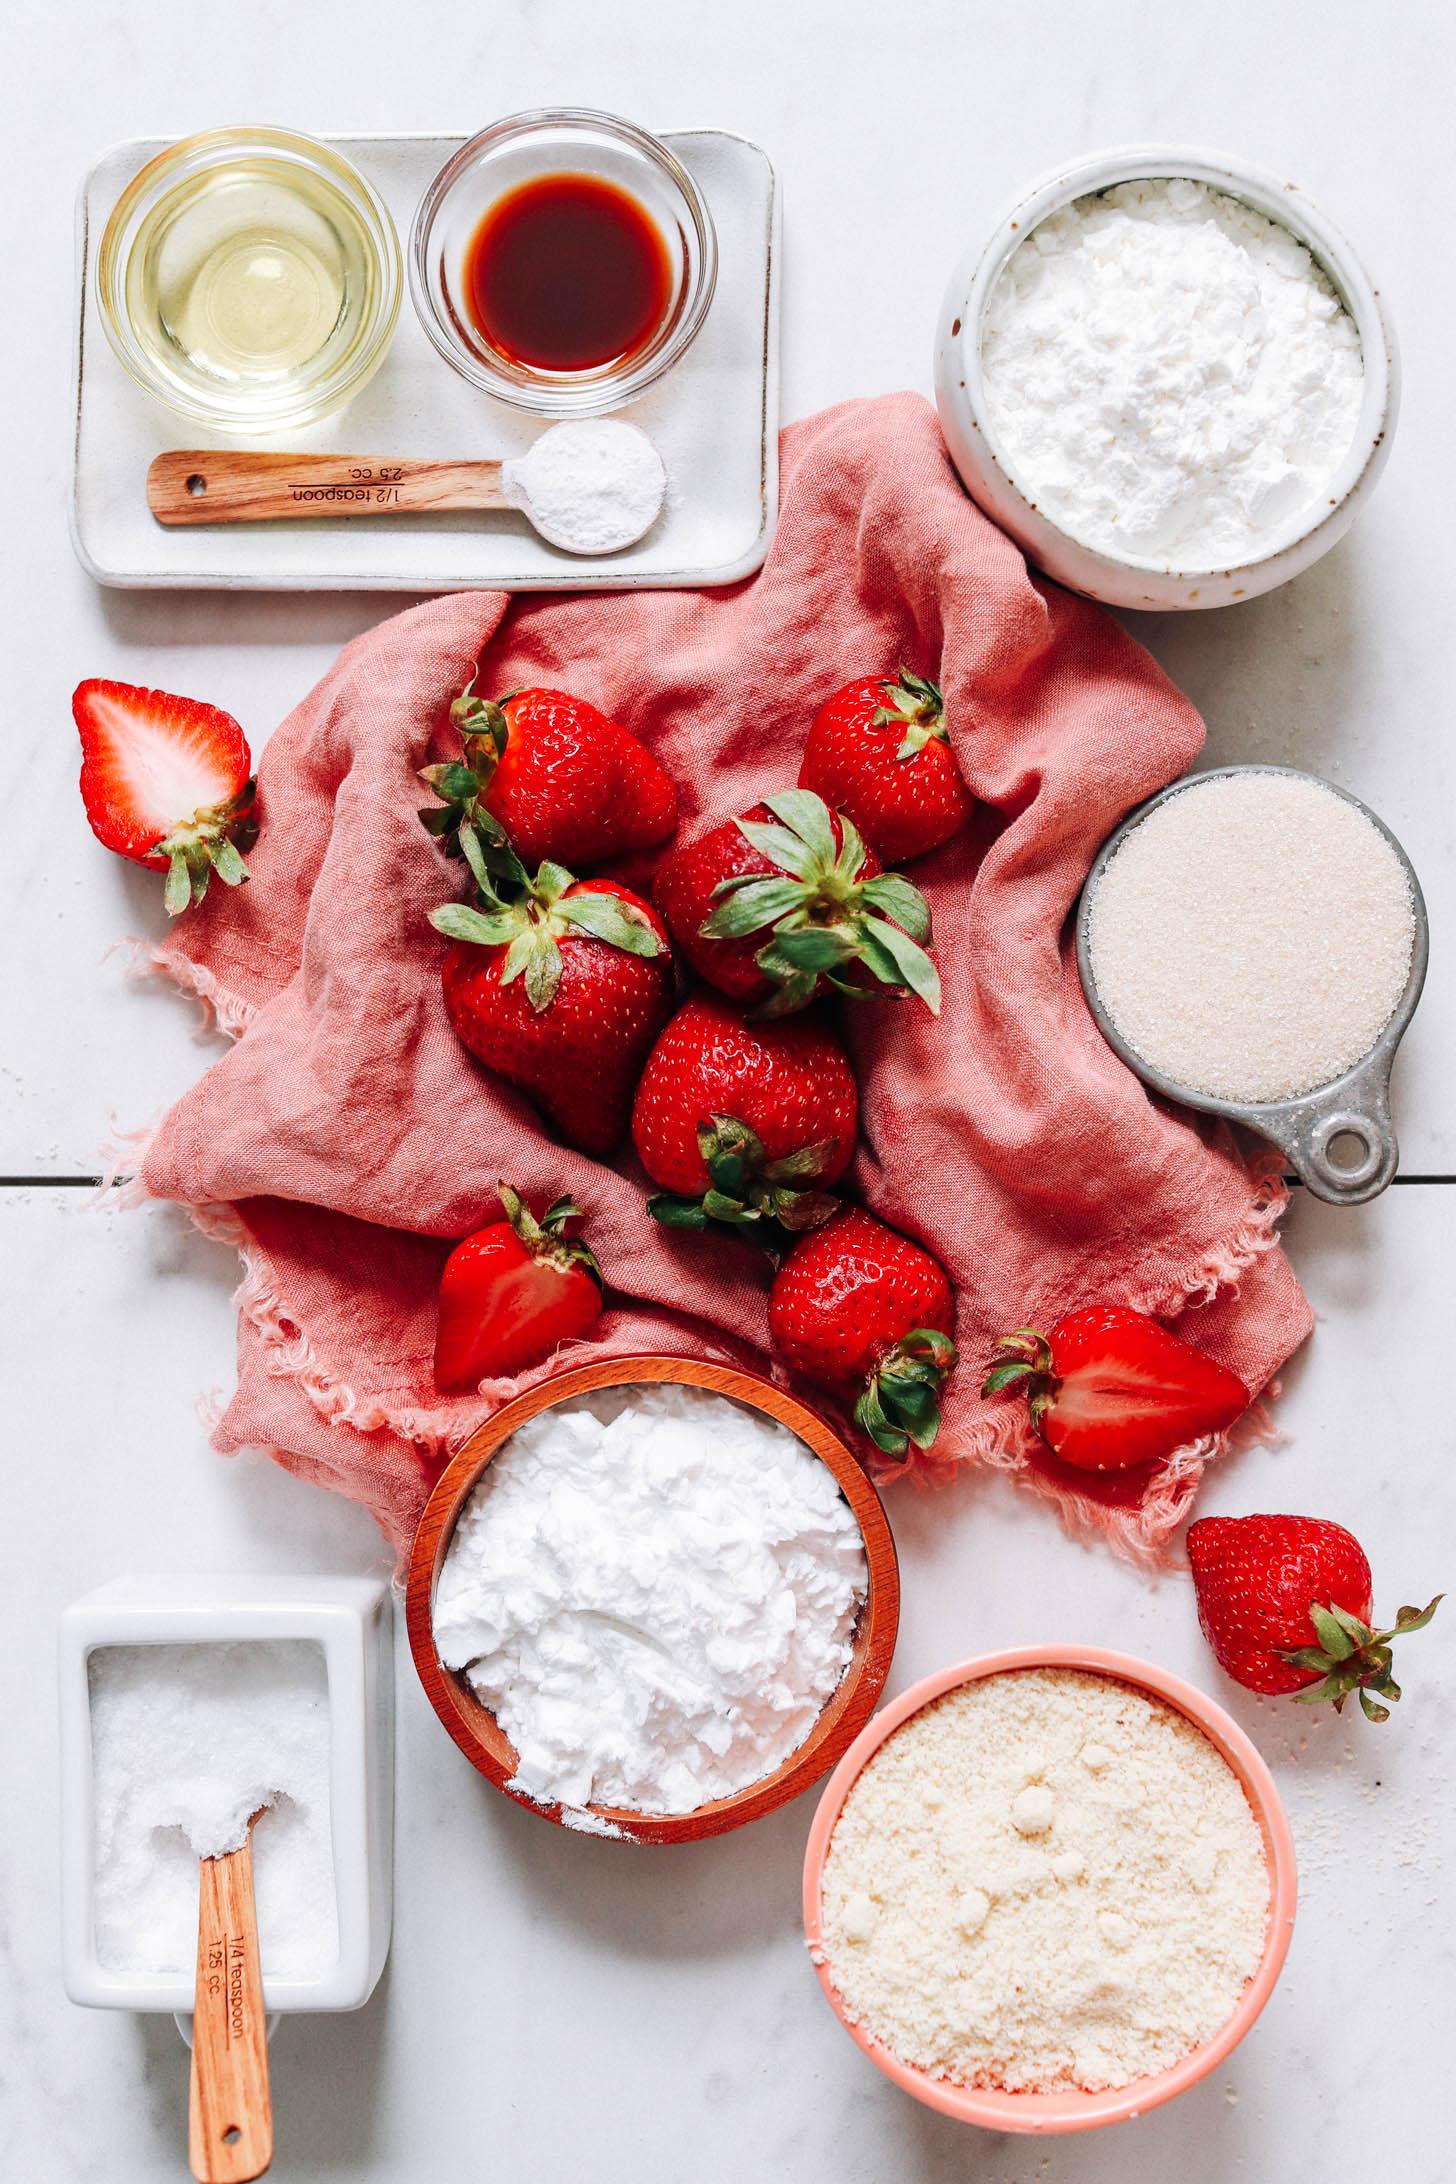 Avocado oil, vanilla, strawberries, baking powder, potato starch, cane sugar, salt, and almond flour